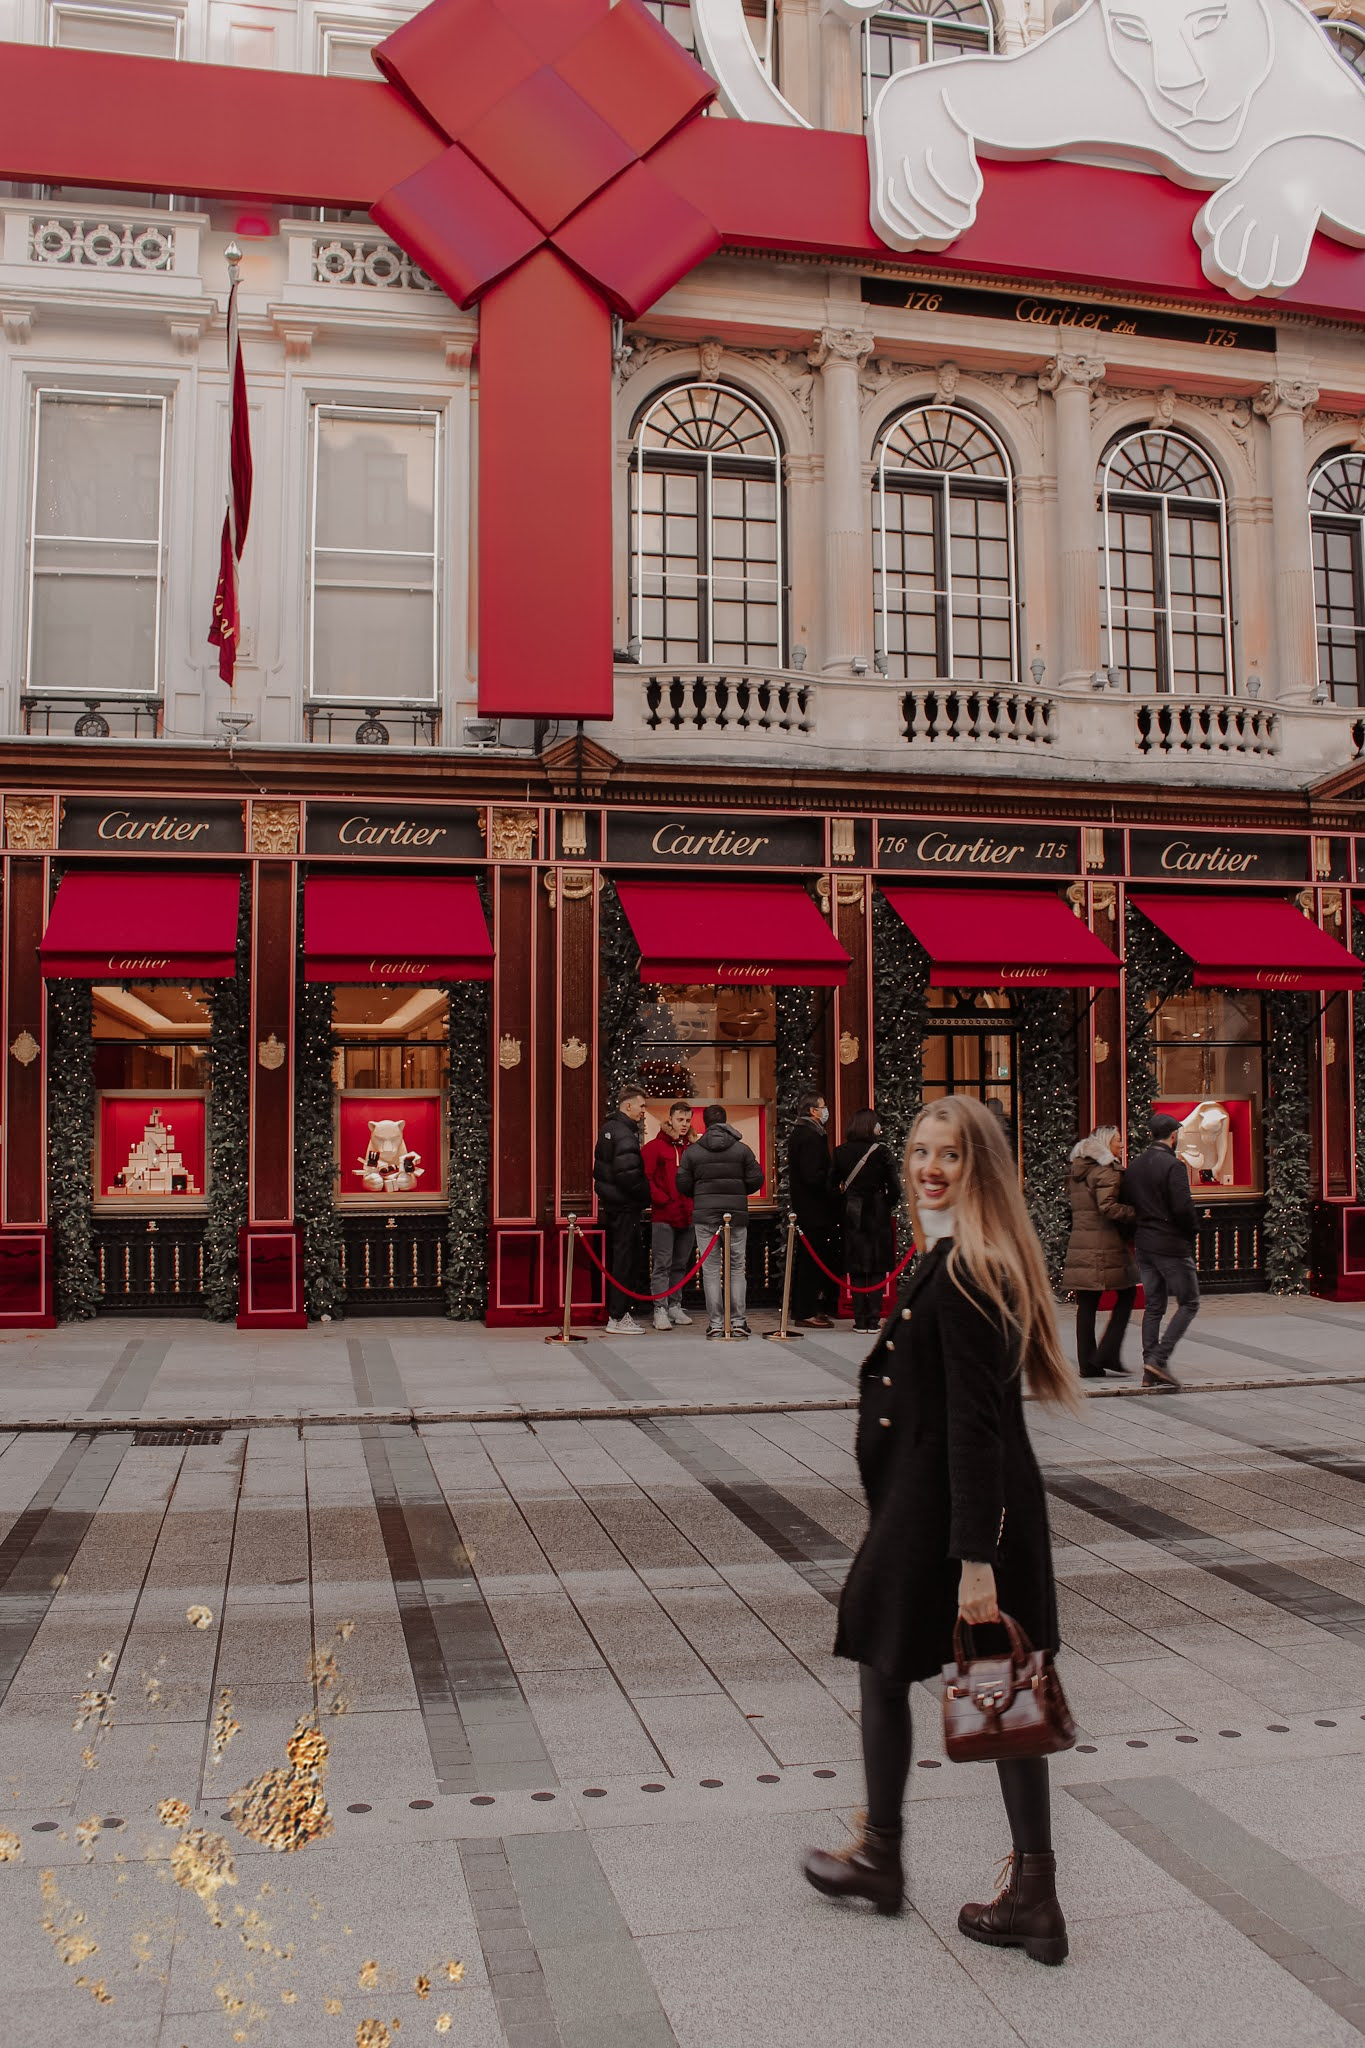 Cartier London Christmas Decorations 2020